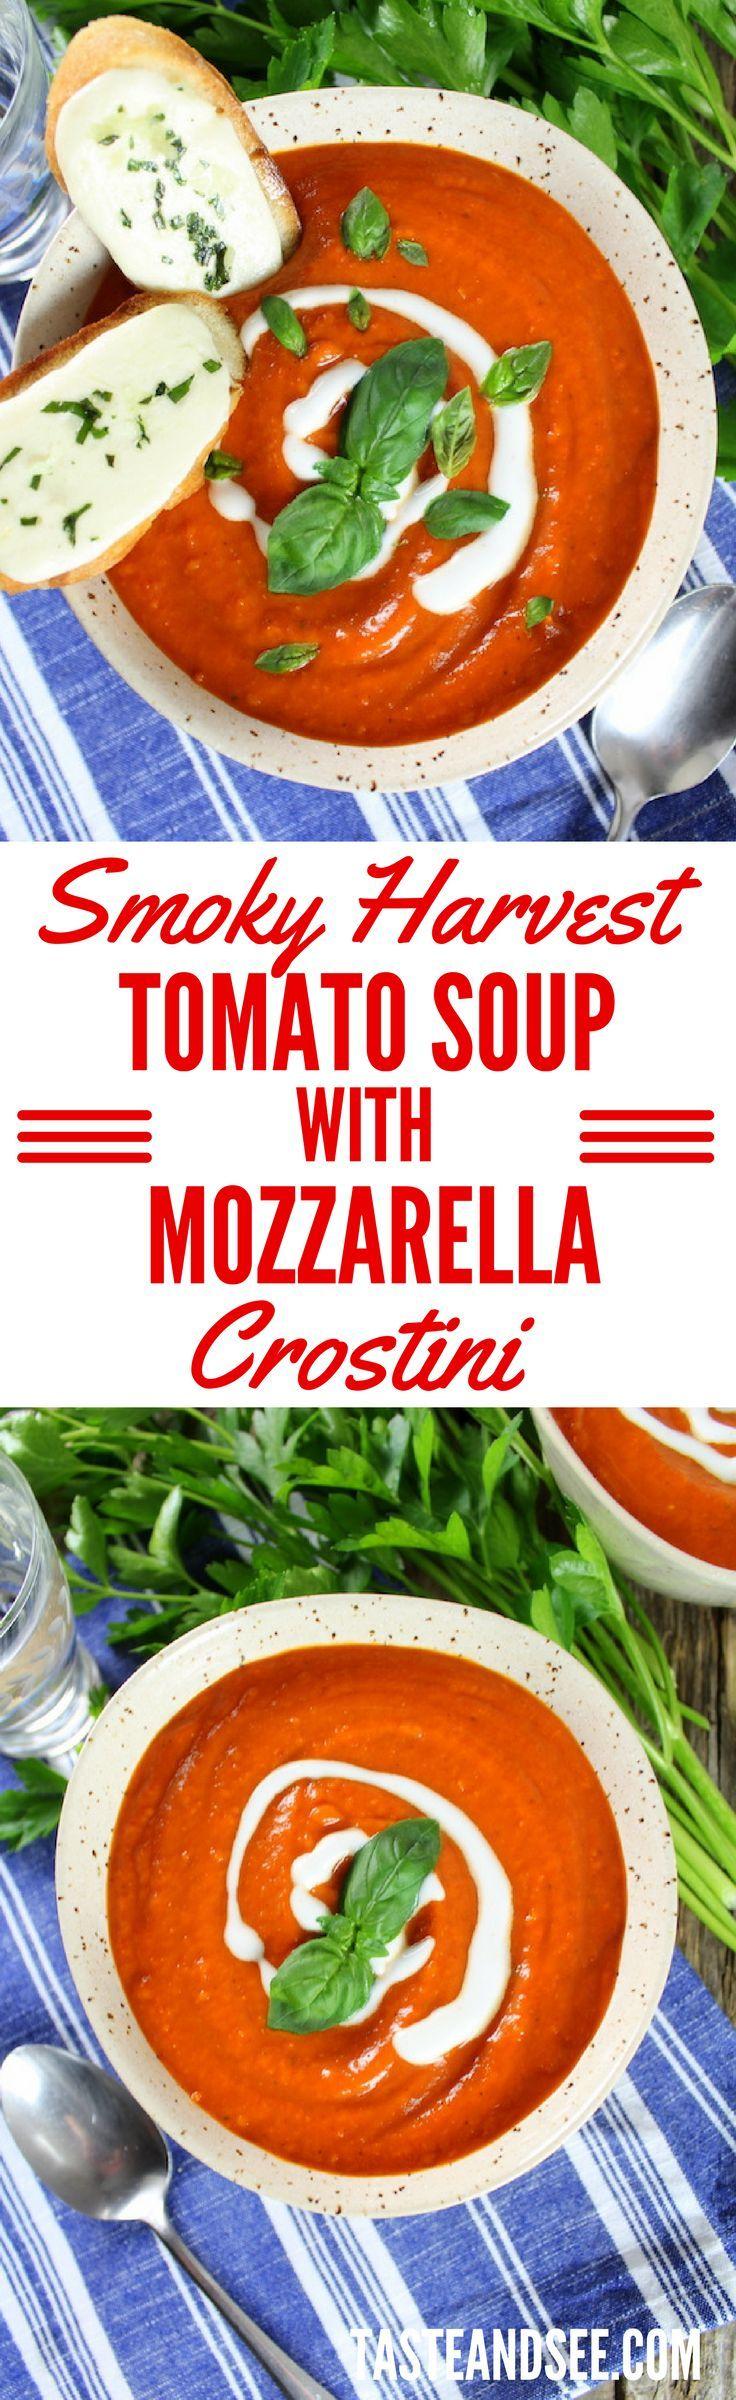 Smoky Harvest Tomato Soup with Mozzarella Crostini!  Smoky, hearty, & full of healthy goodness.   http://tasteandsee.com